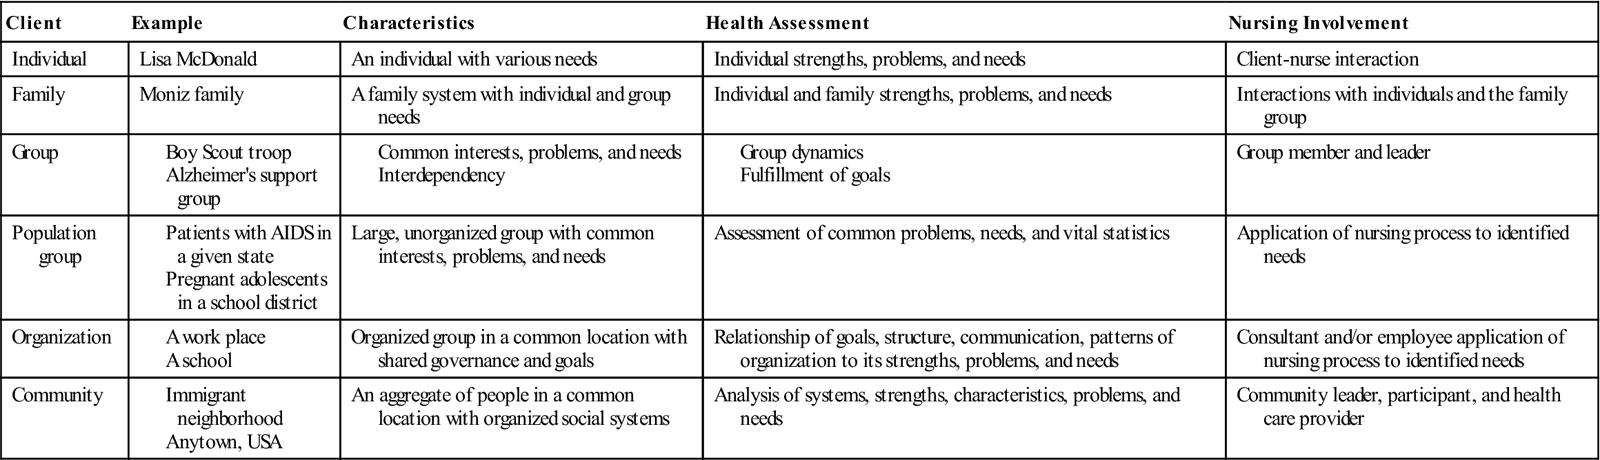 7 Community Health Planning Implementation And Evaluation Nurse Key